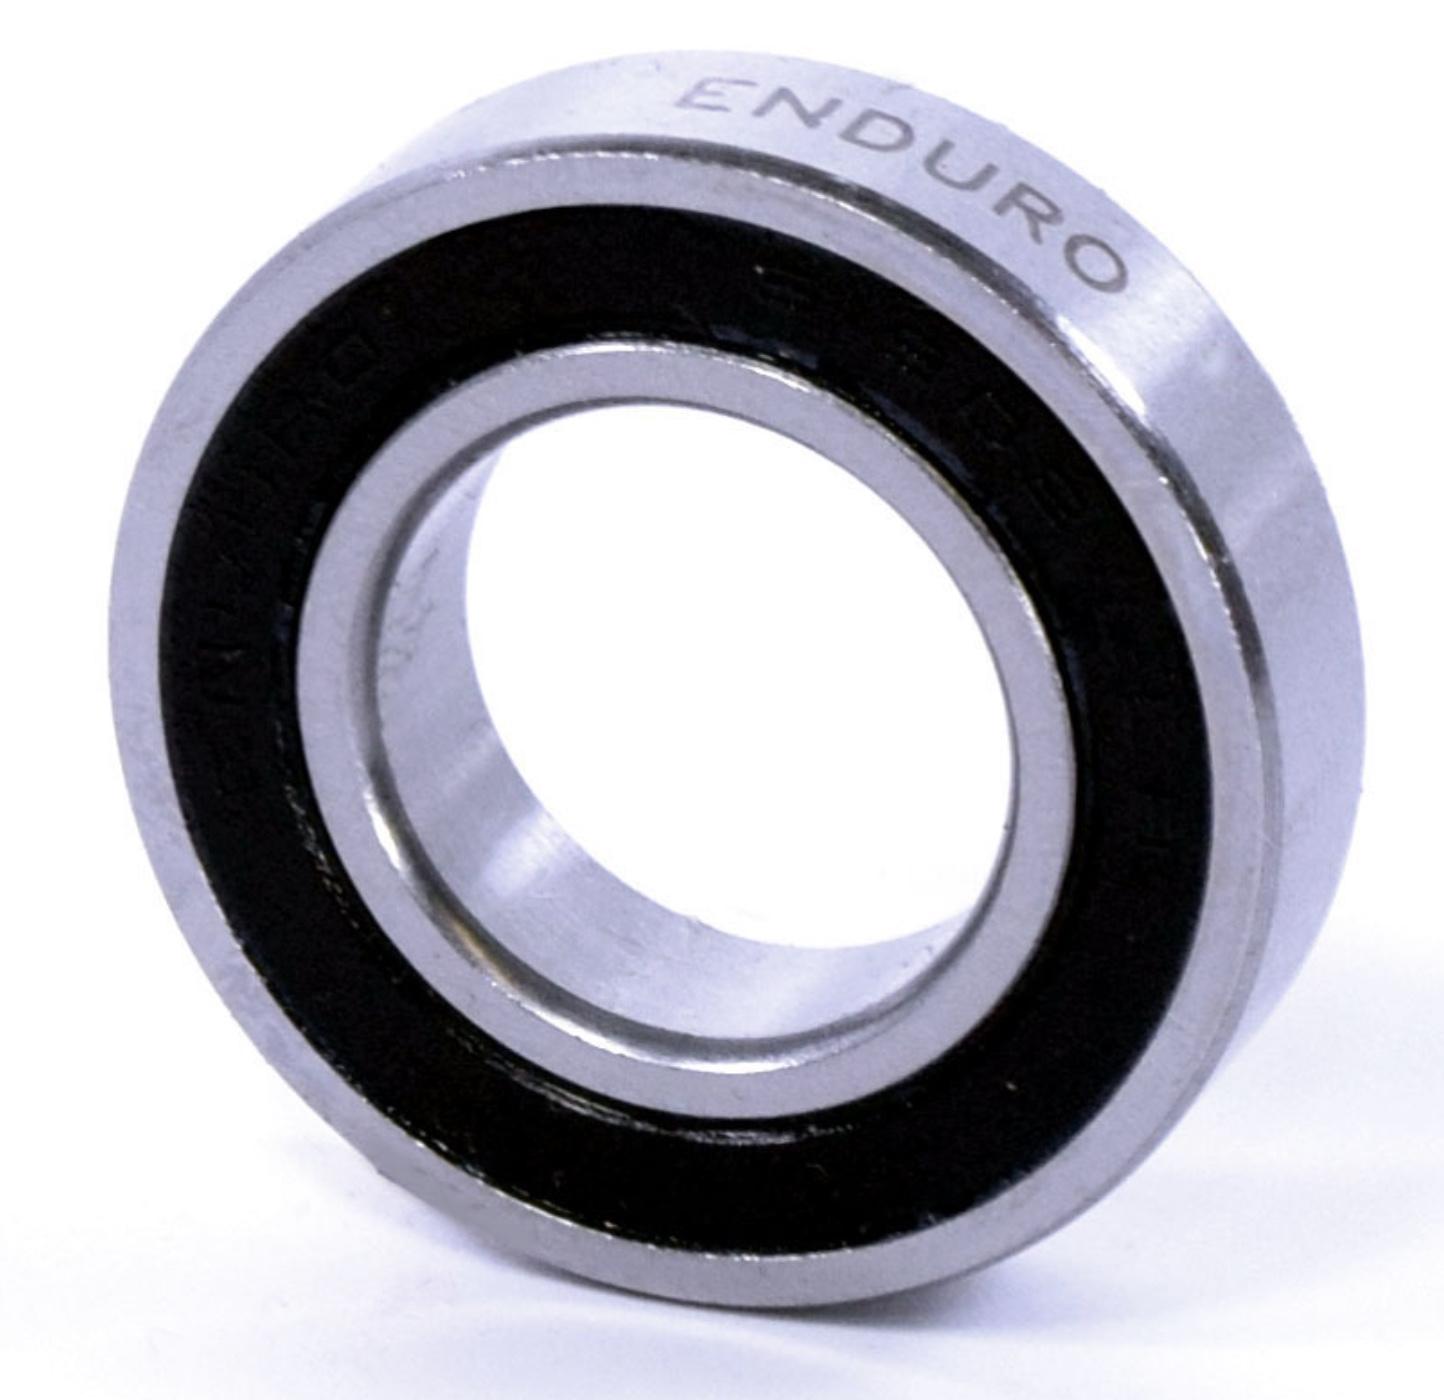 Kugleleje Enduro 6902-2RS ABEC5 LLB (28x15x7 mm) - EB8128 | Bottom brackets bearings